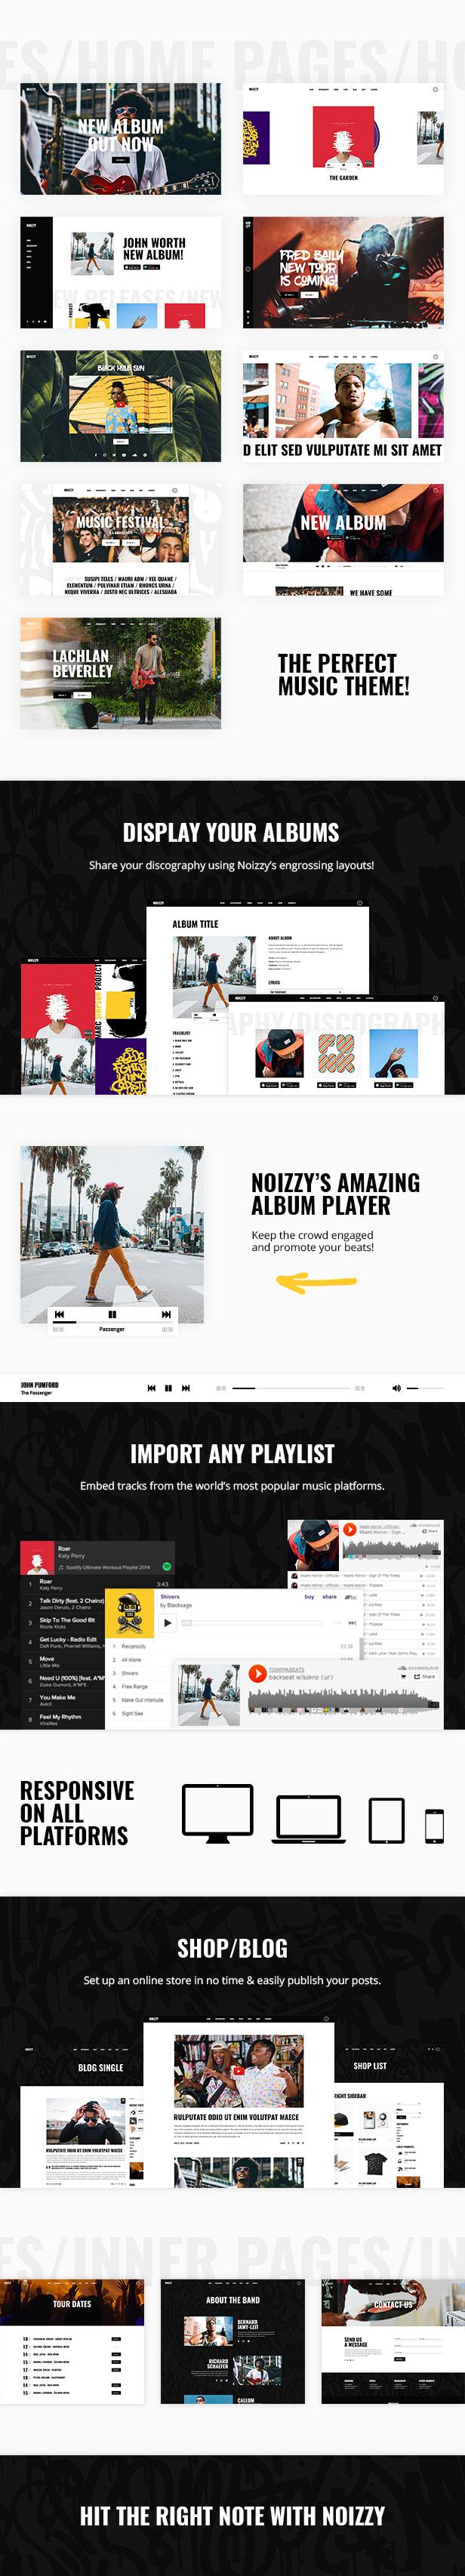 Noizzy - Music Band WordPress Theme - 1